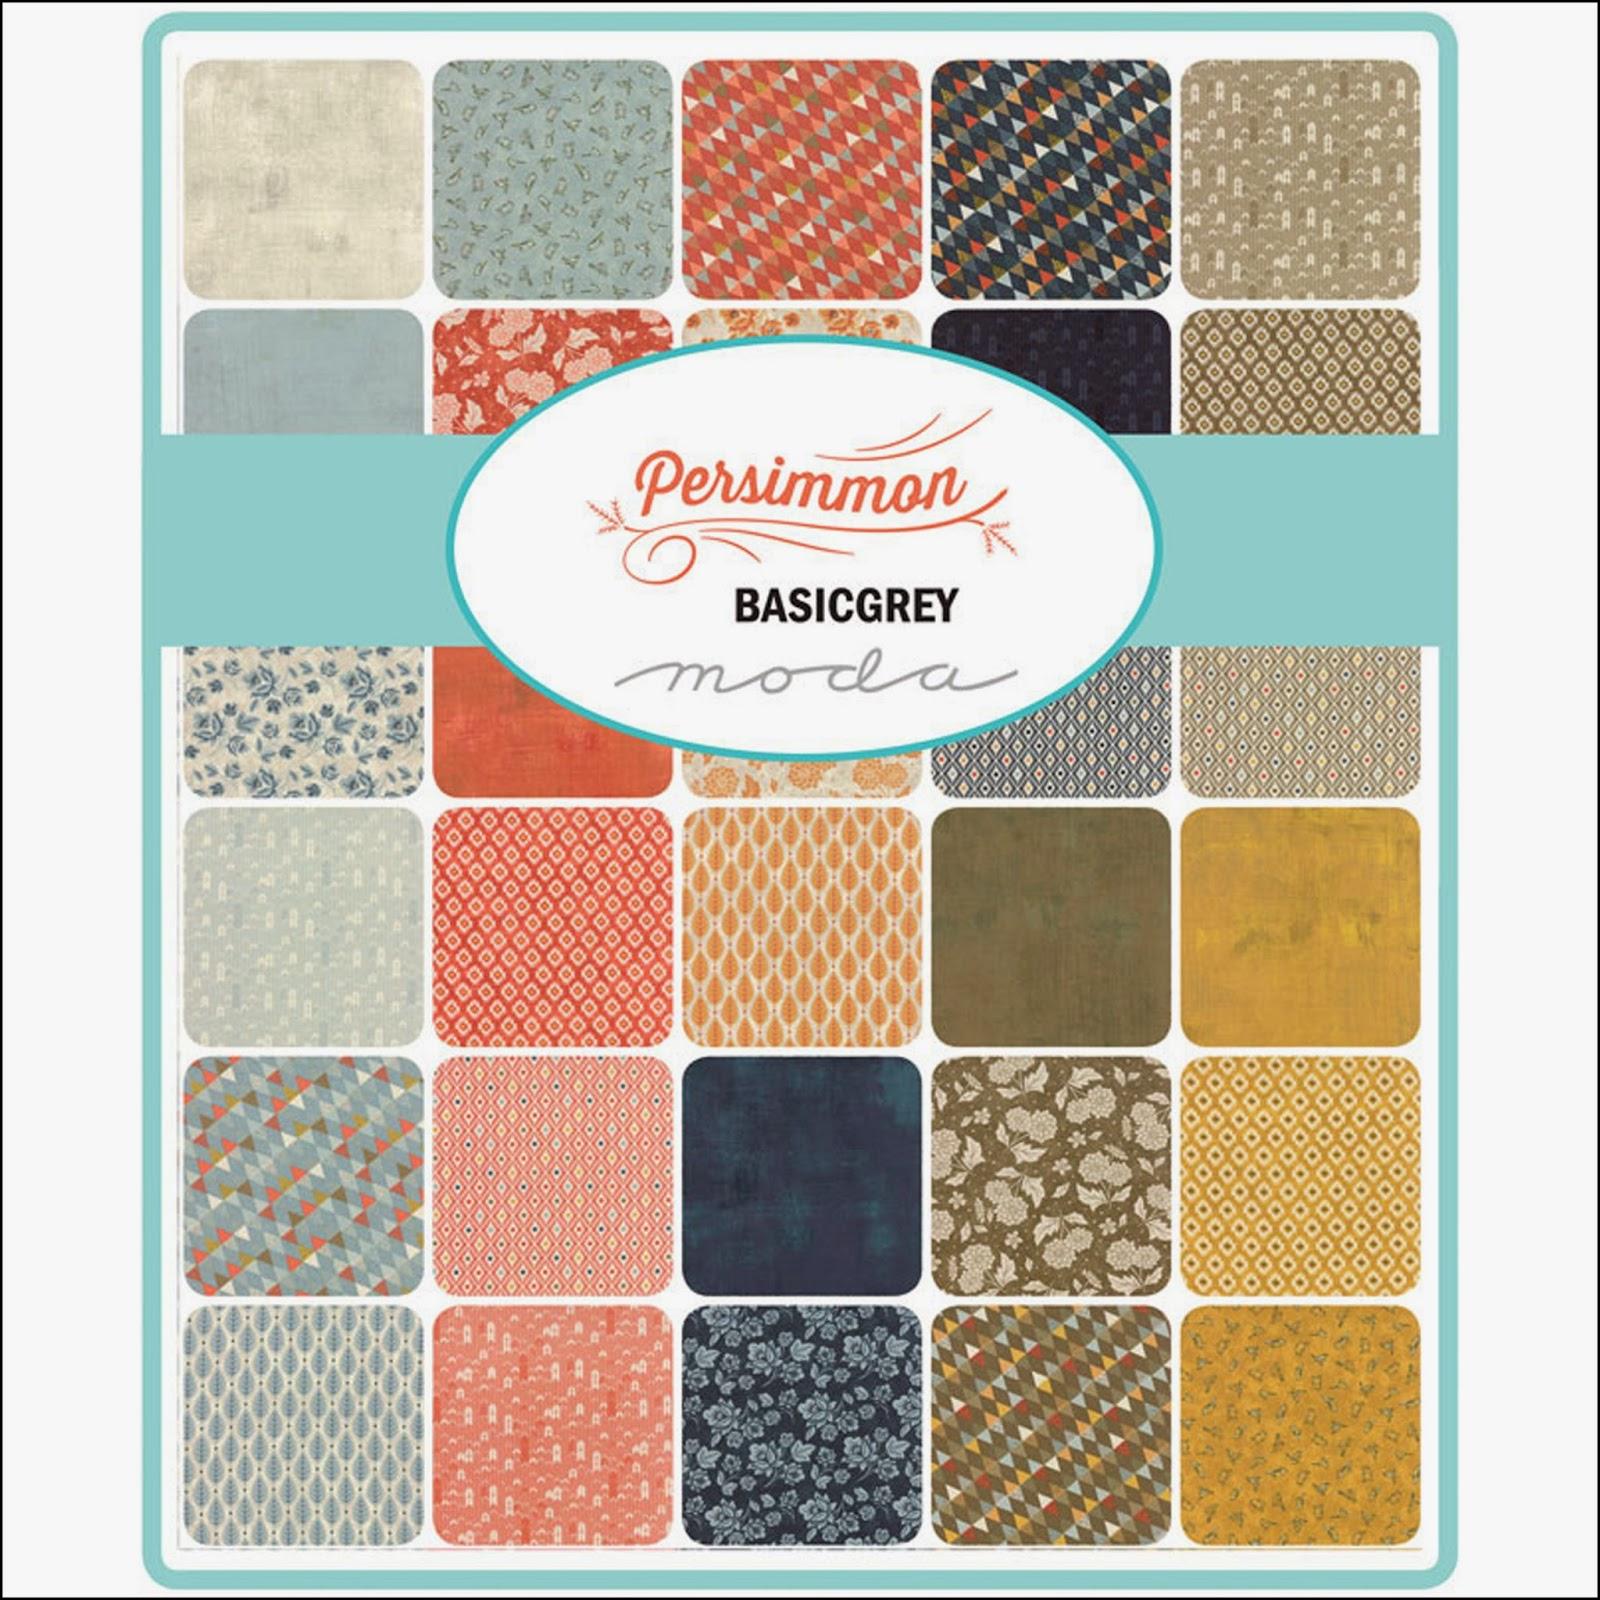 Moda PERSIMMON Quilt Fabric by Basic Grey for Moda Fabrics